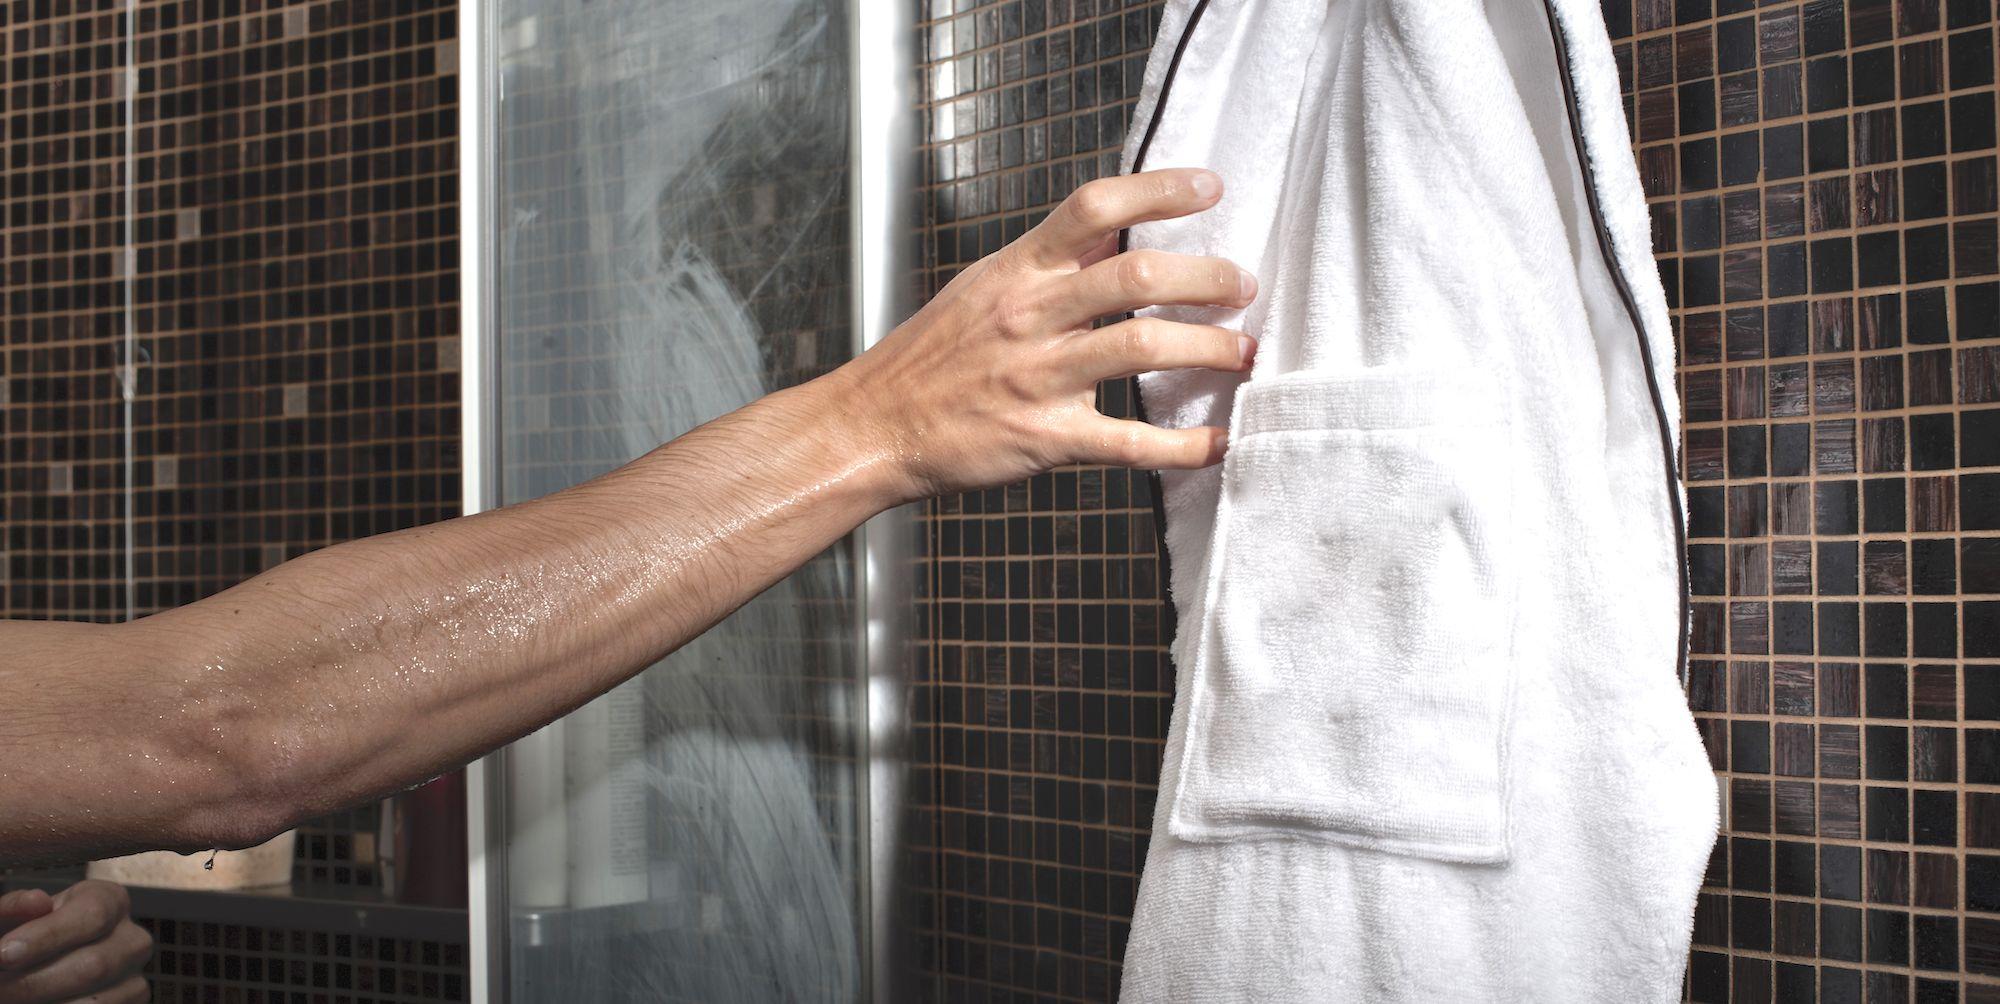 11 Essential Personal Hygiene Tips, Courtesy of Reddit